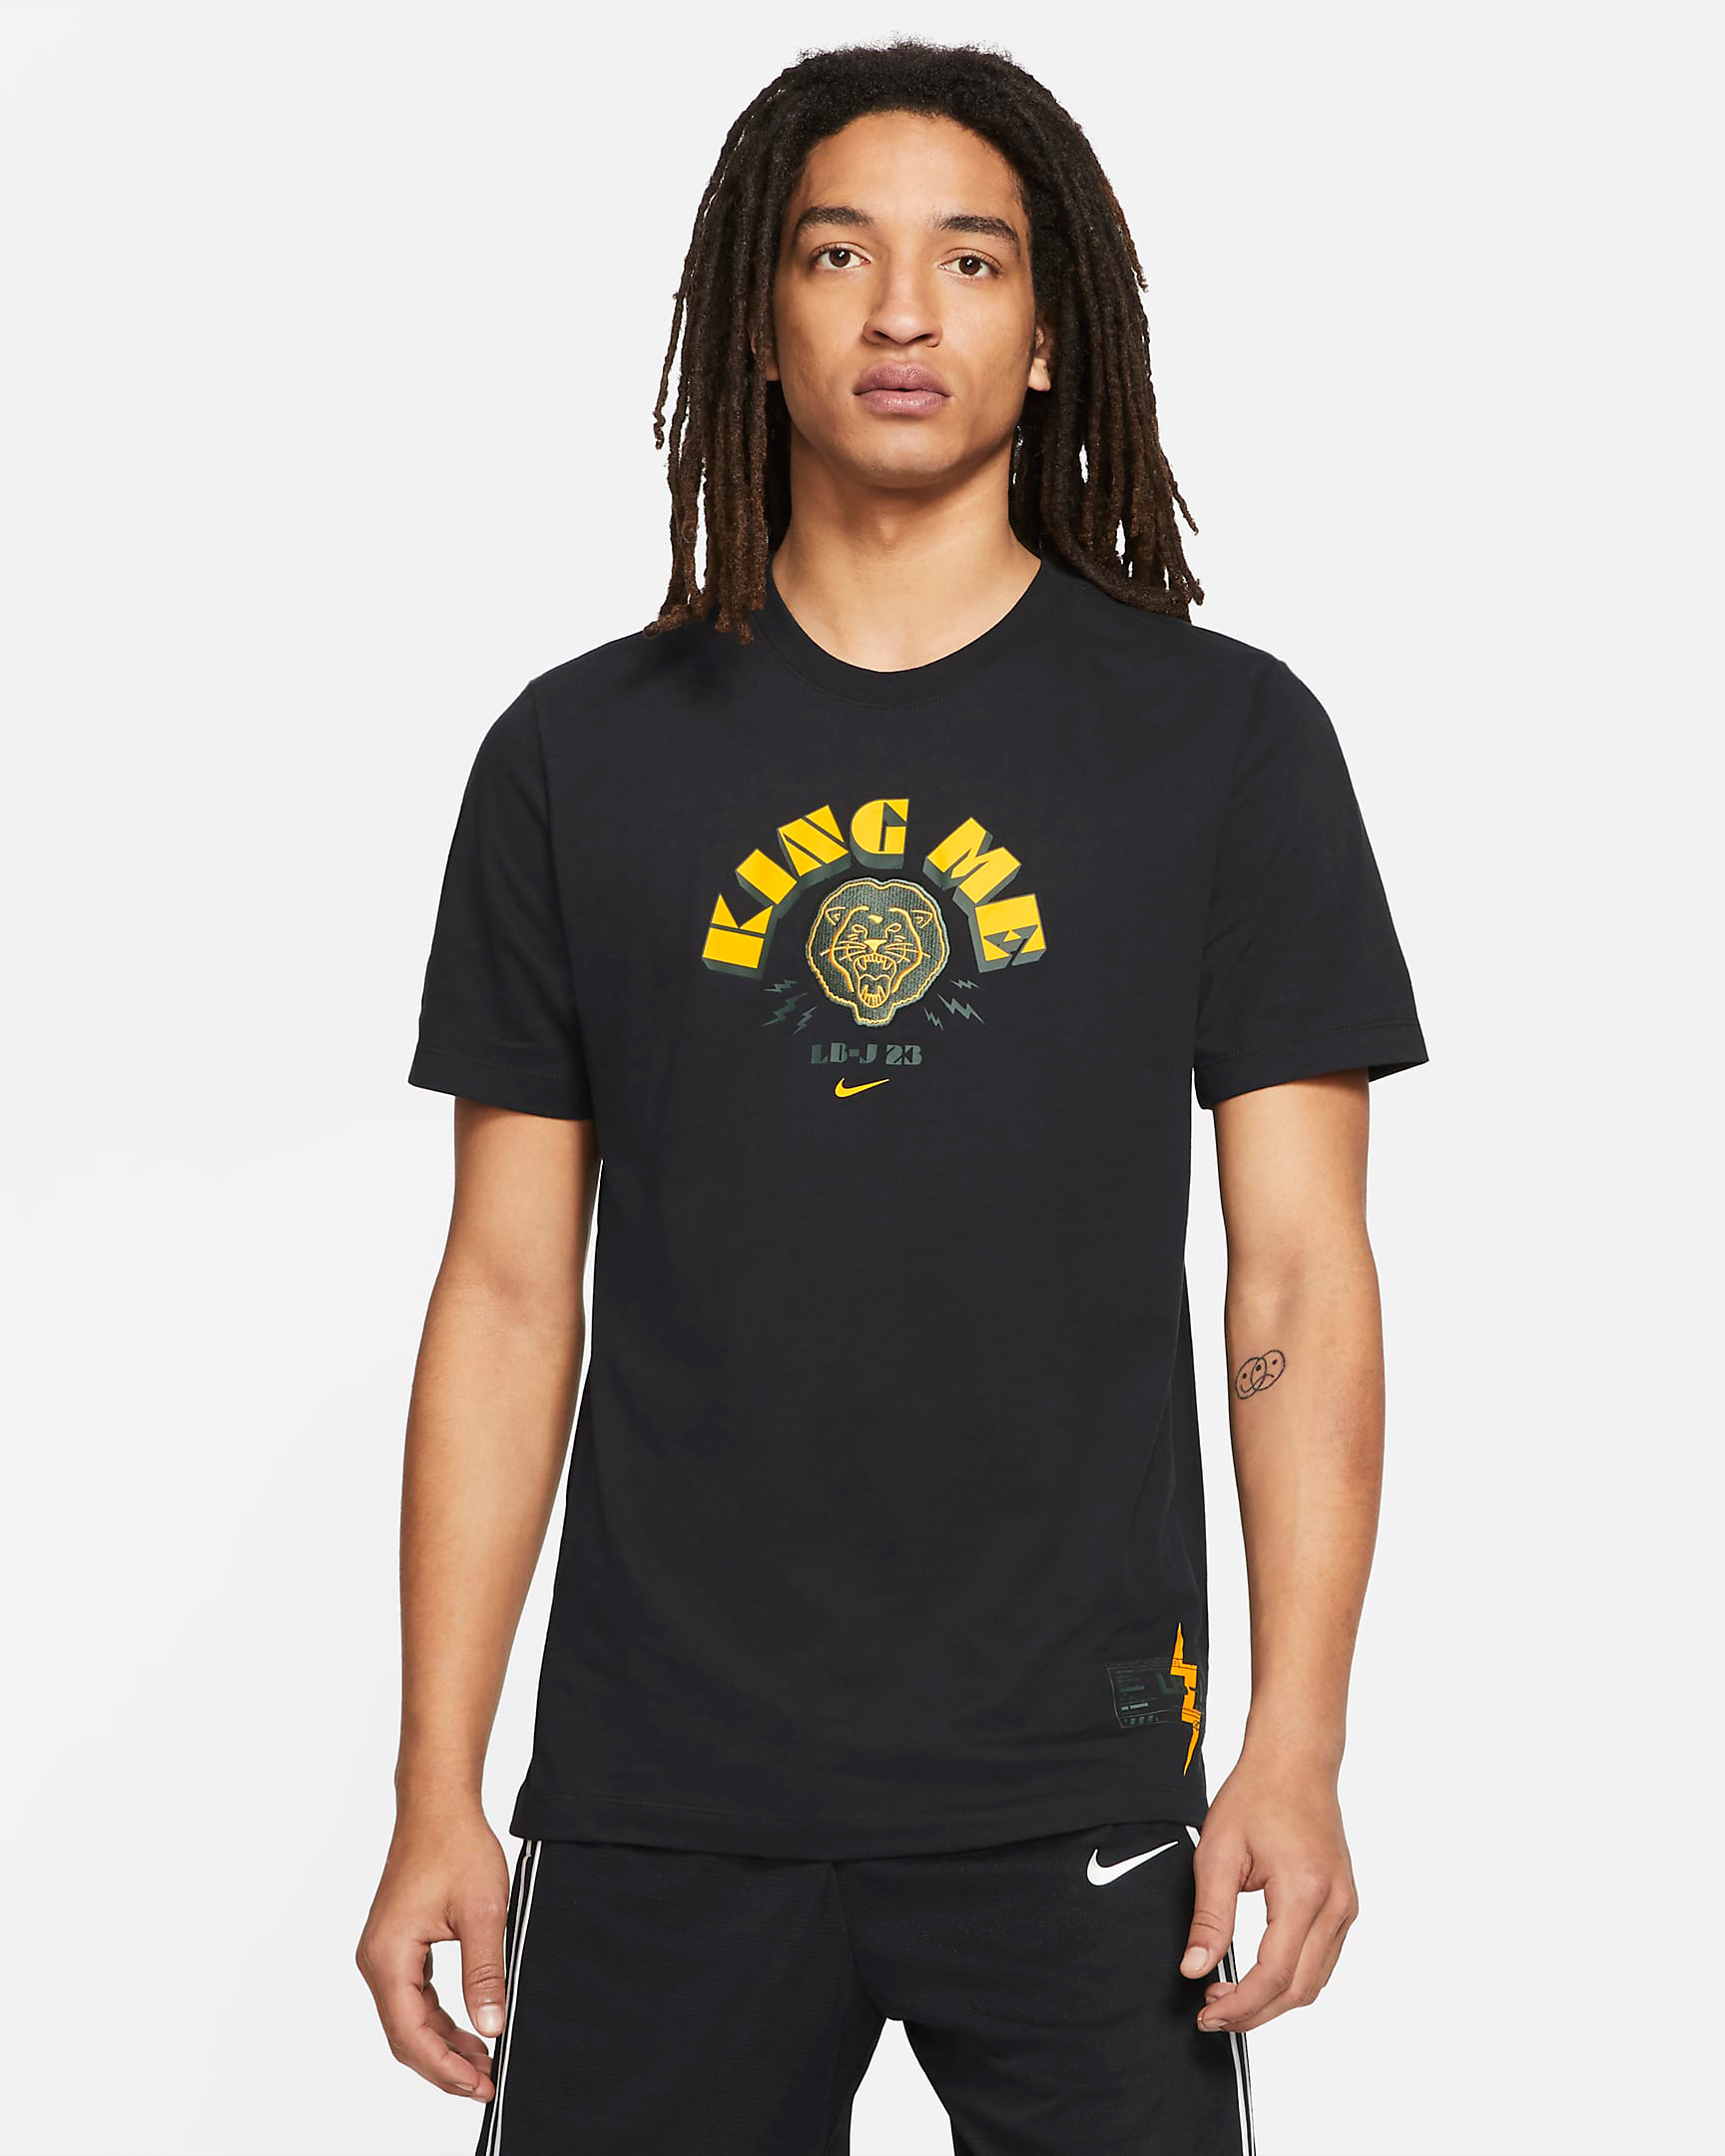 nike-lebron-king-me-shirt-black-yellow-gold-1